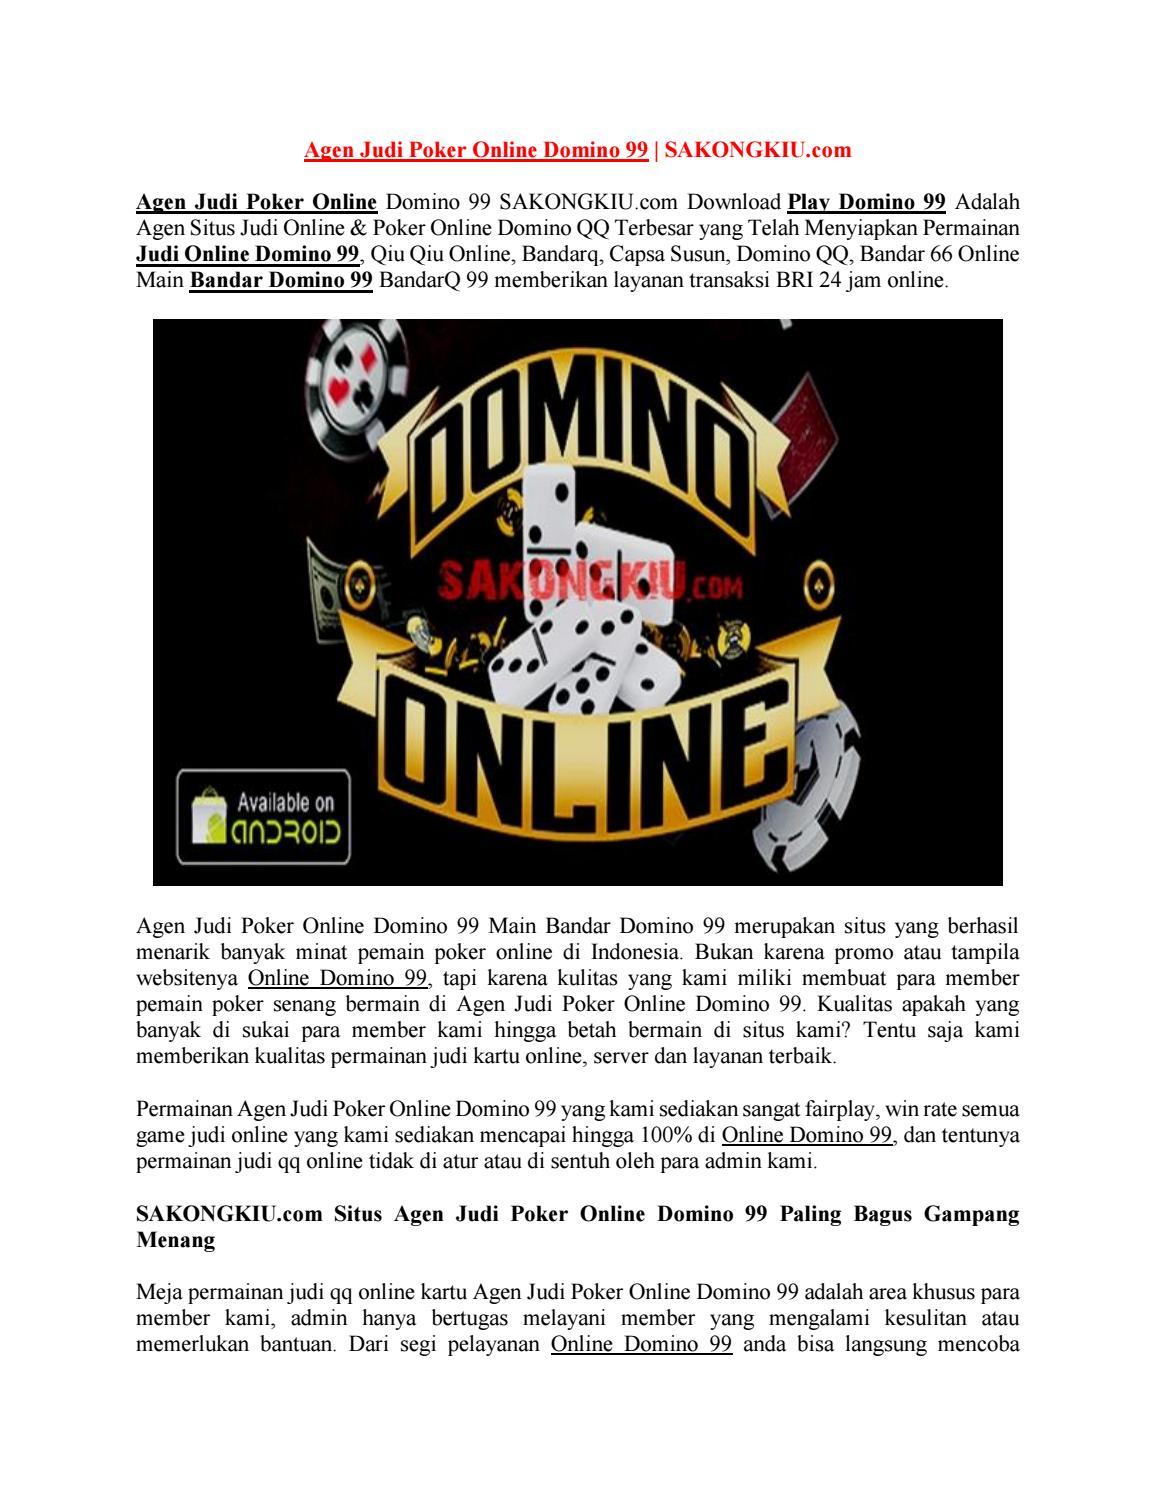 Agen Judi Poker Online Domino 99 By Jagojudi Issuu